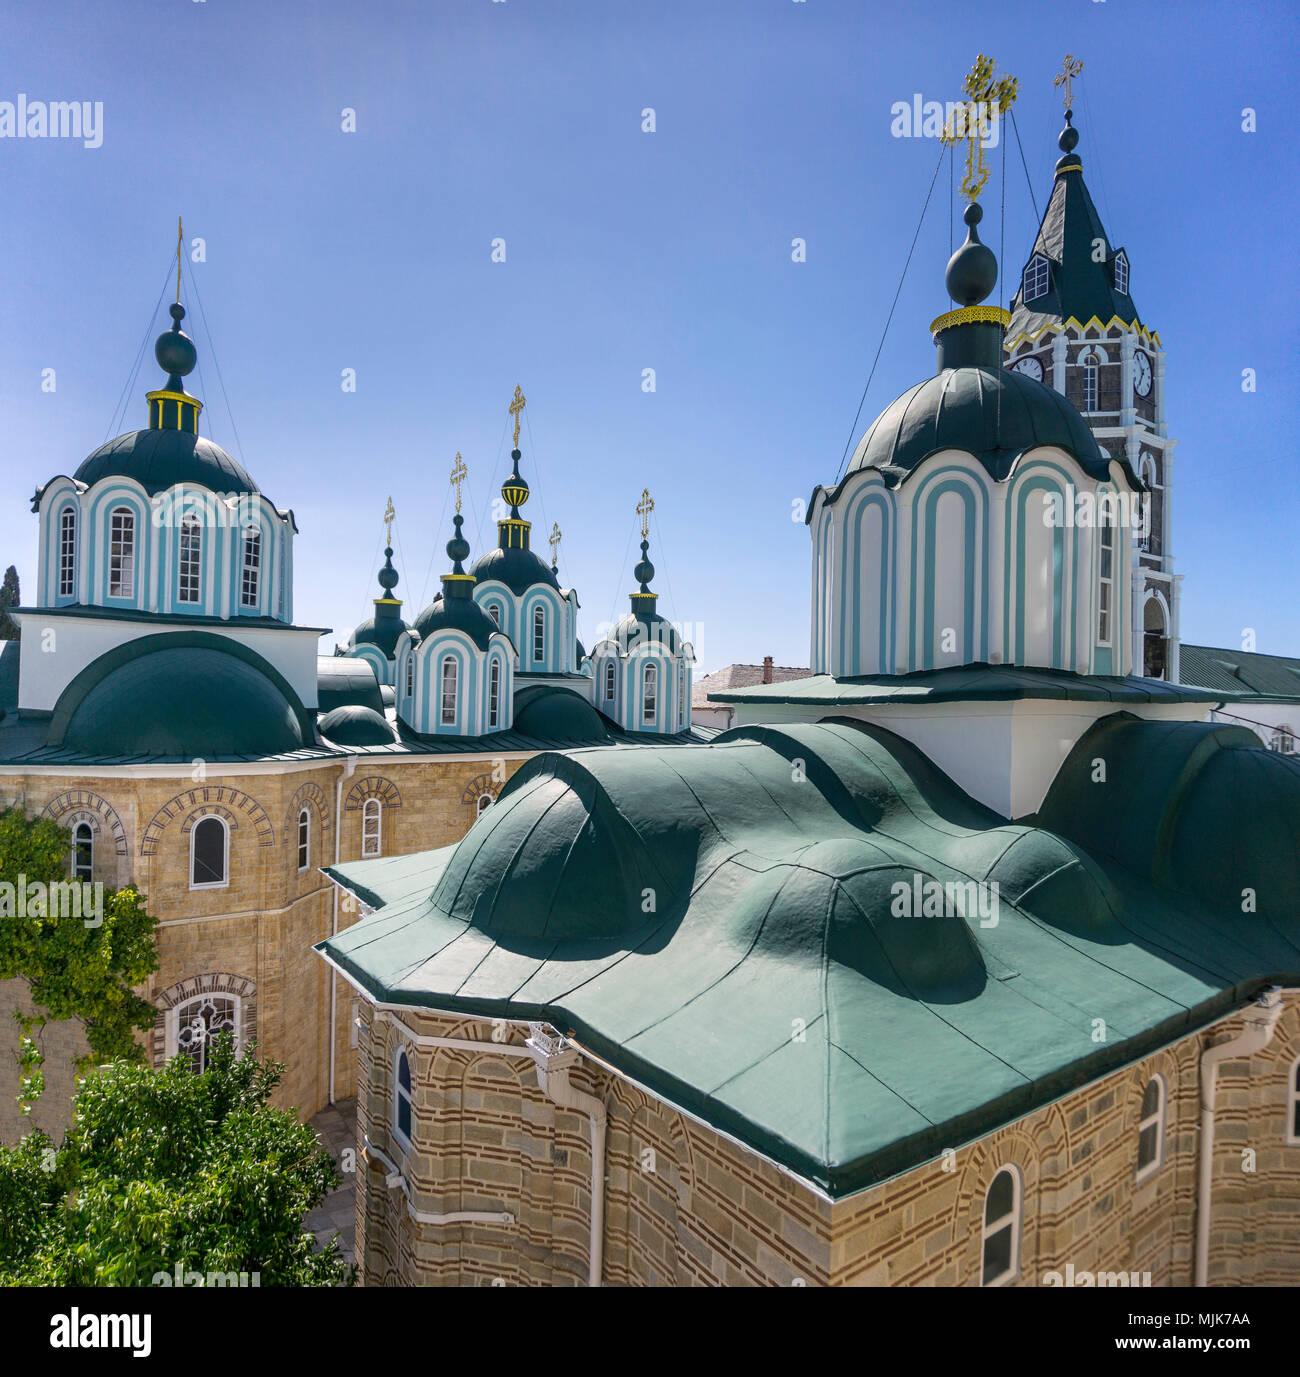 Cupolas on the Katholikon at the center of St. Panteleimon, a Russian monastery  on The Athos peninsula, Macedonia, Northern Greece - Stock Image